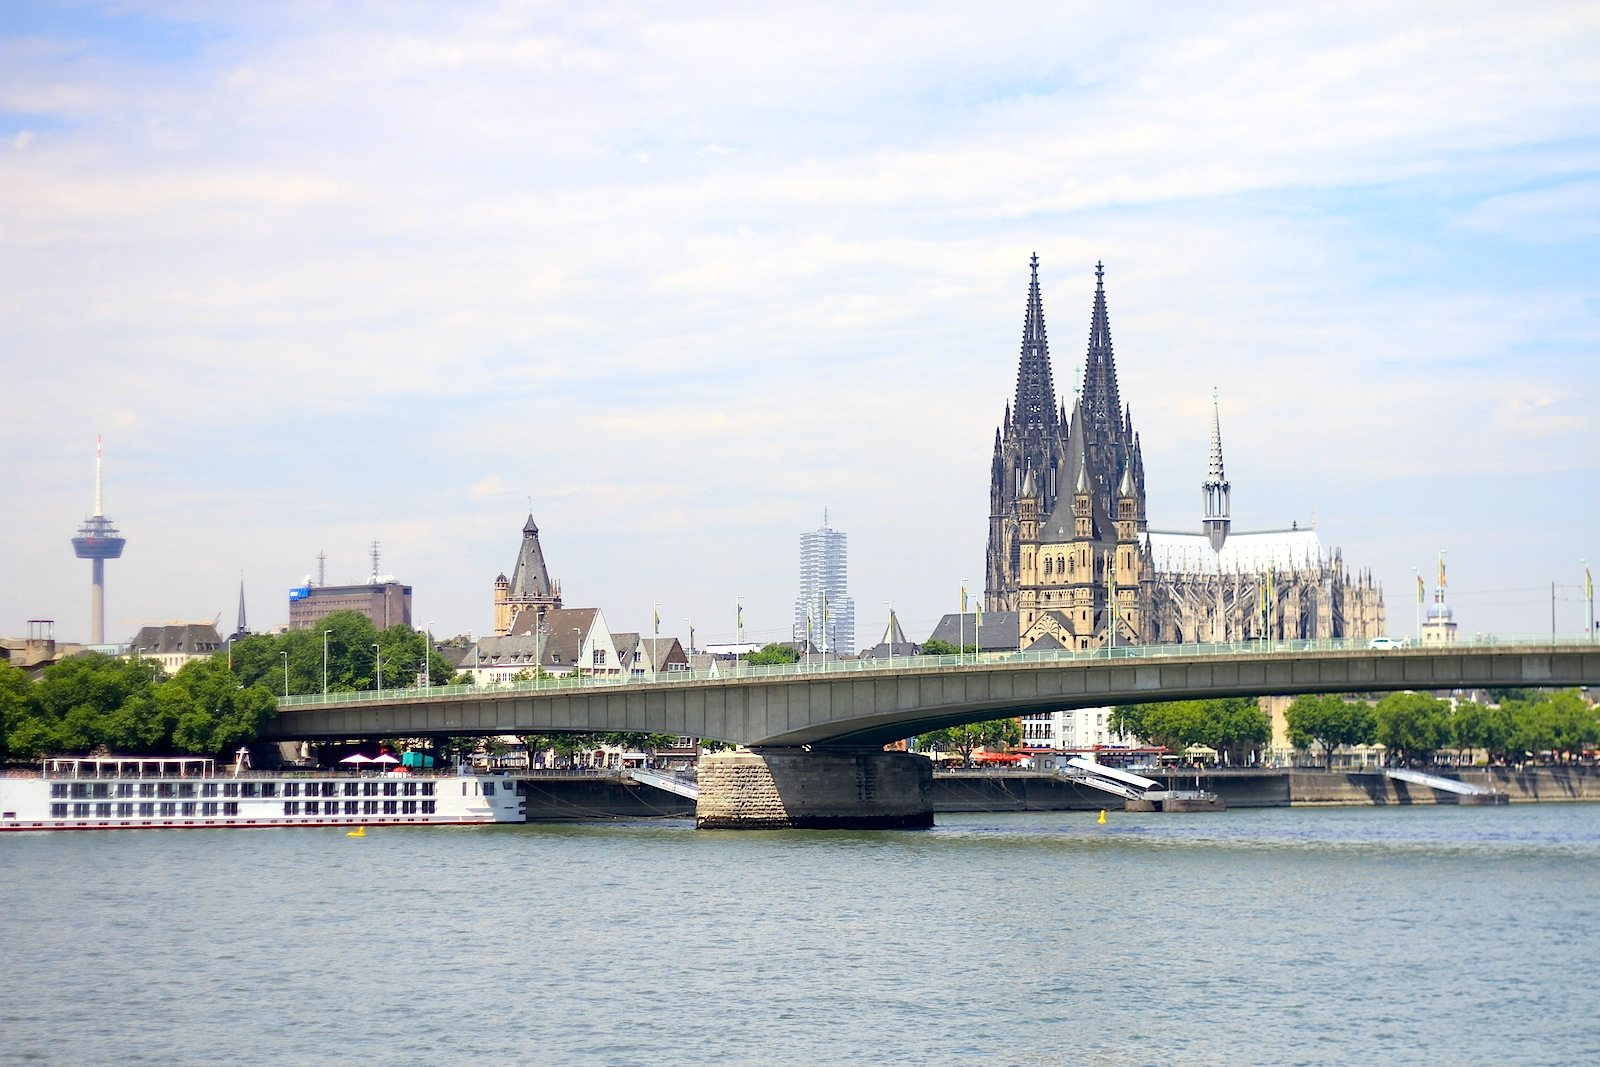 Altstadt. Deutzer Brücke mit Dom, KölnTurm, Rathaus, WDR, Fernsehturm Colonius.